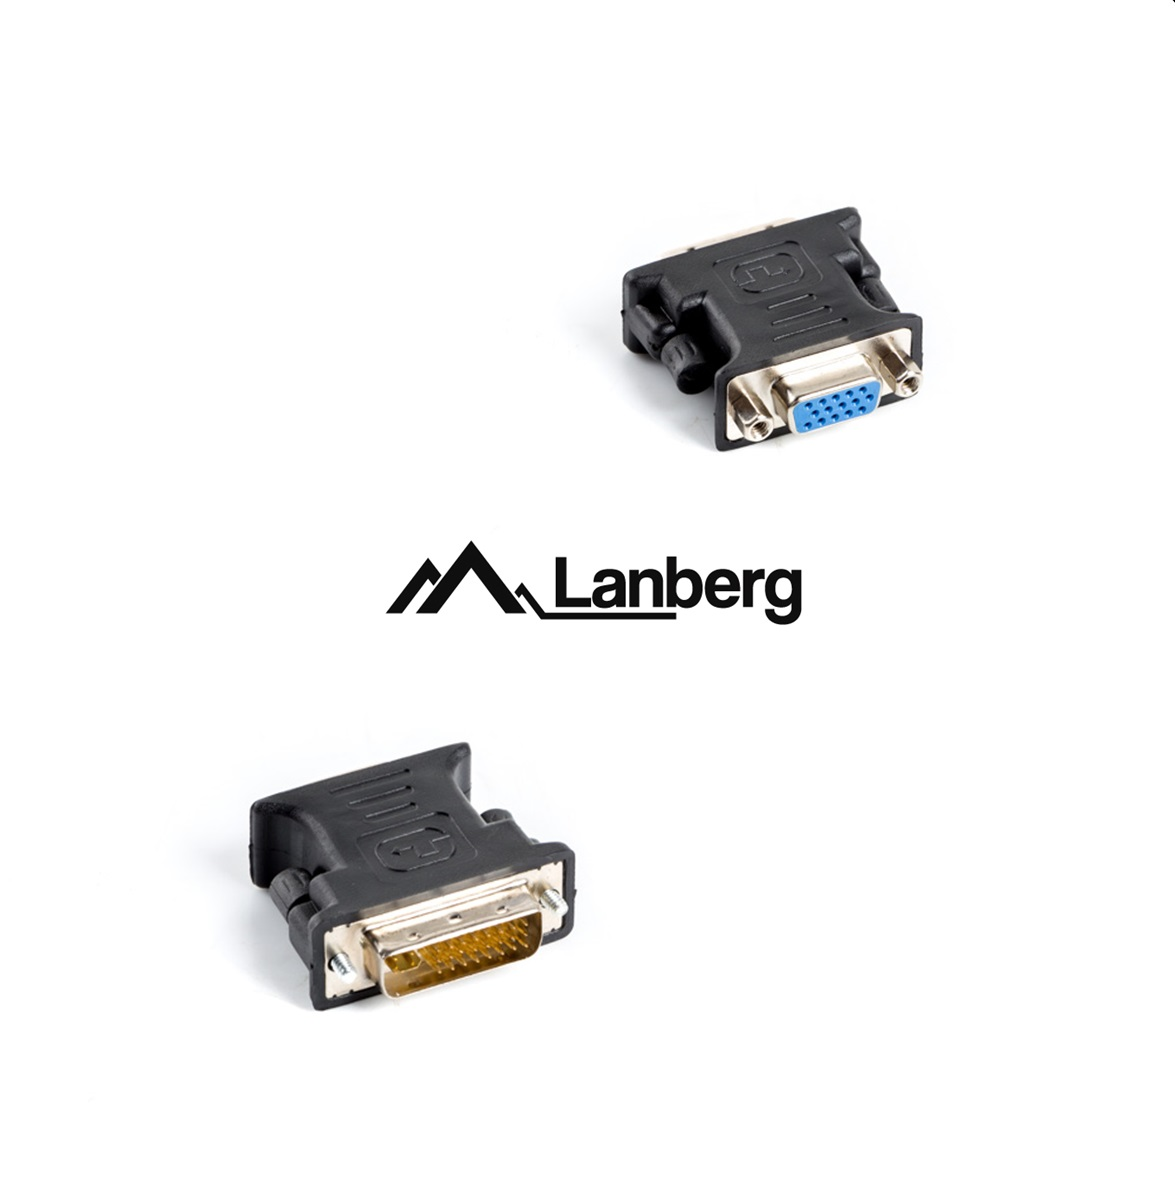 DVI-I 24+5 M to VGA 15-pin F Lanberg